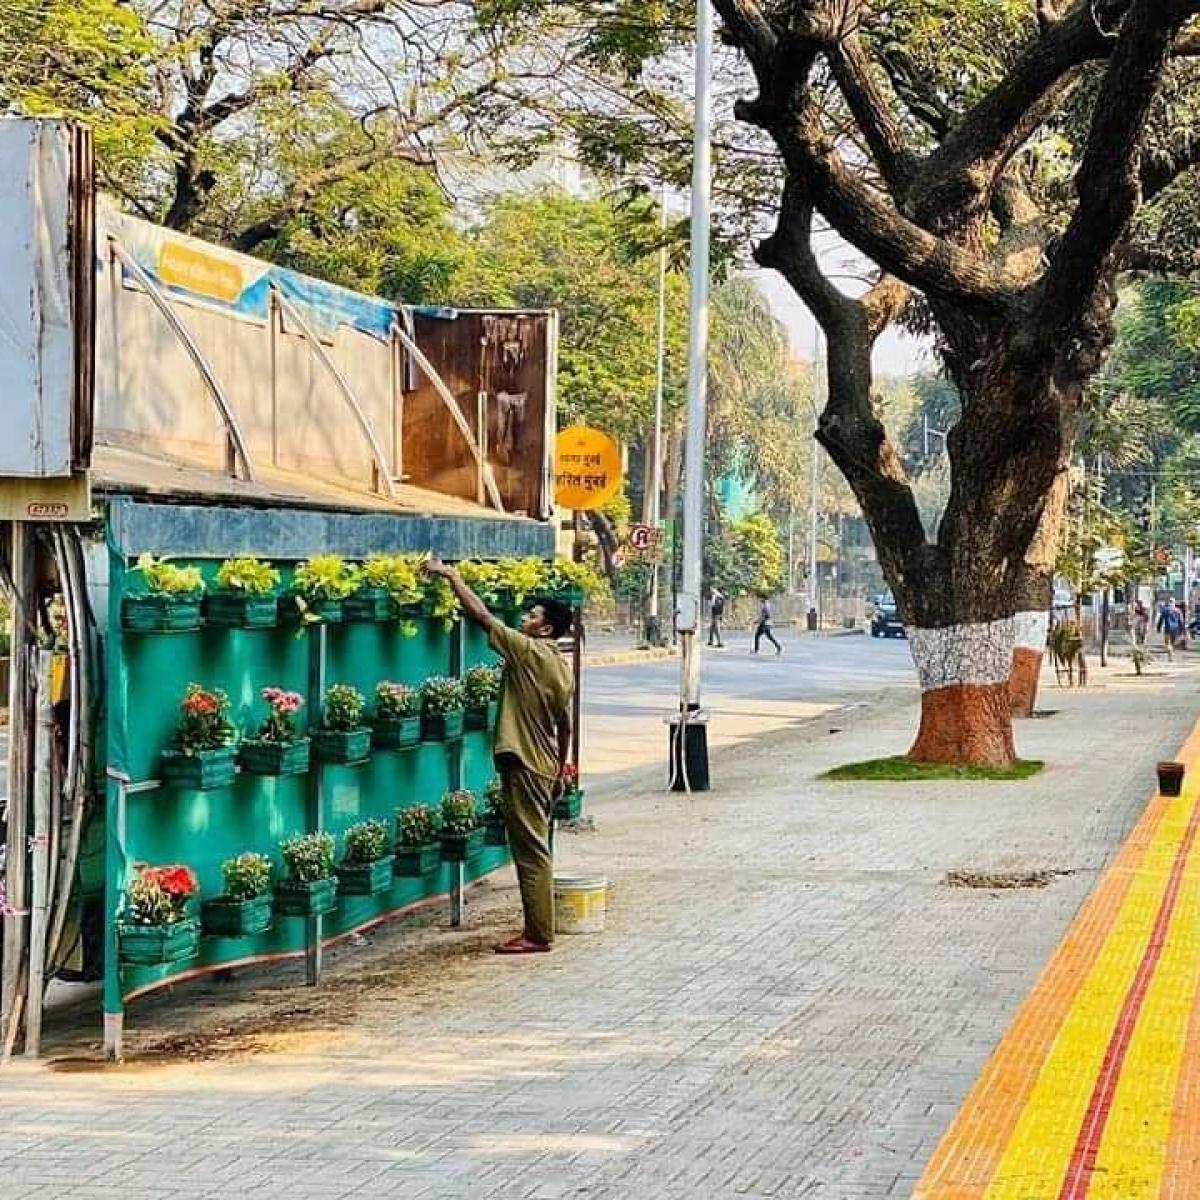 Mumbai: Shivaji Park revamp hits hurdle as residents oppose sewage treatment plant